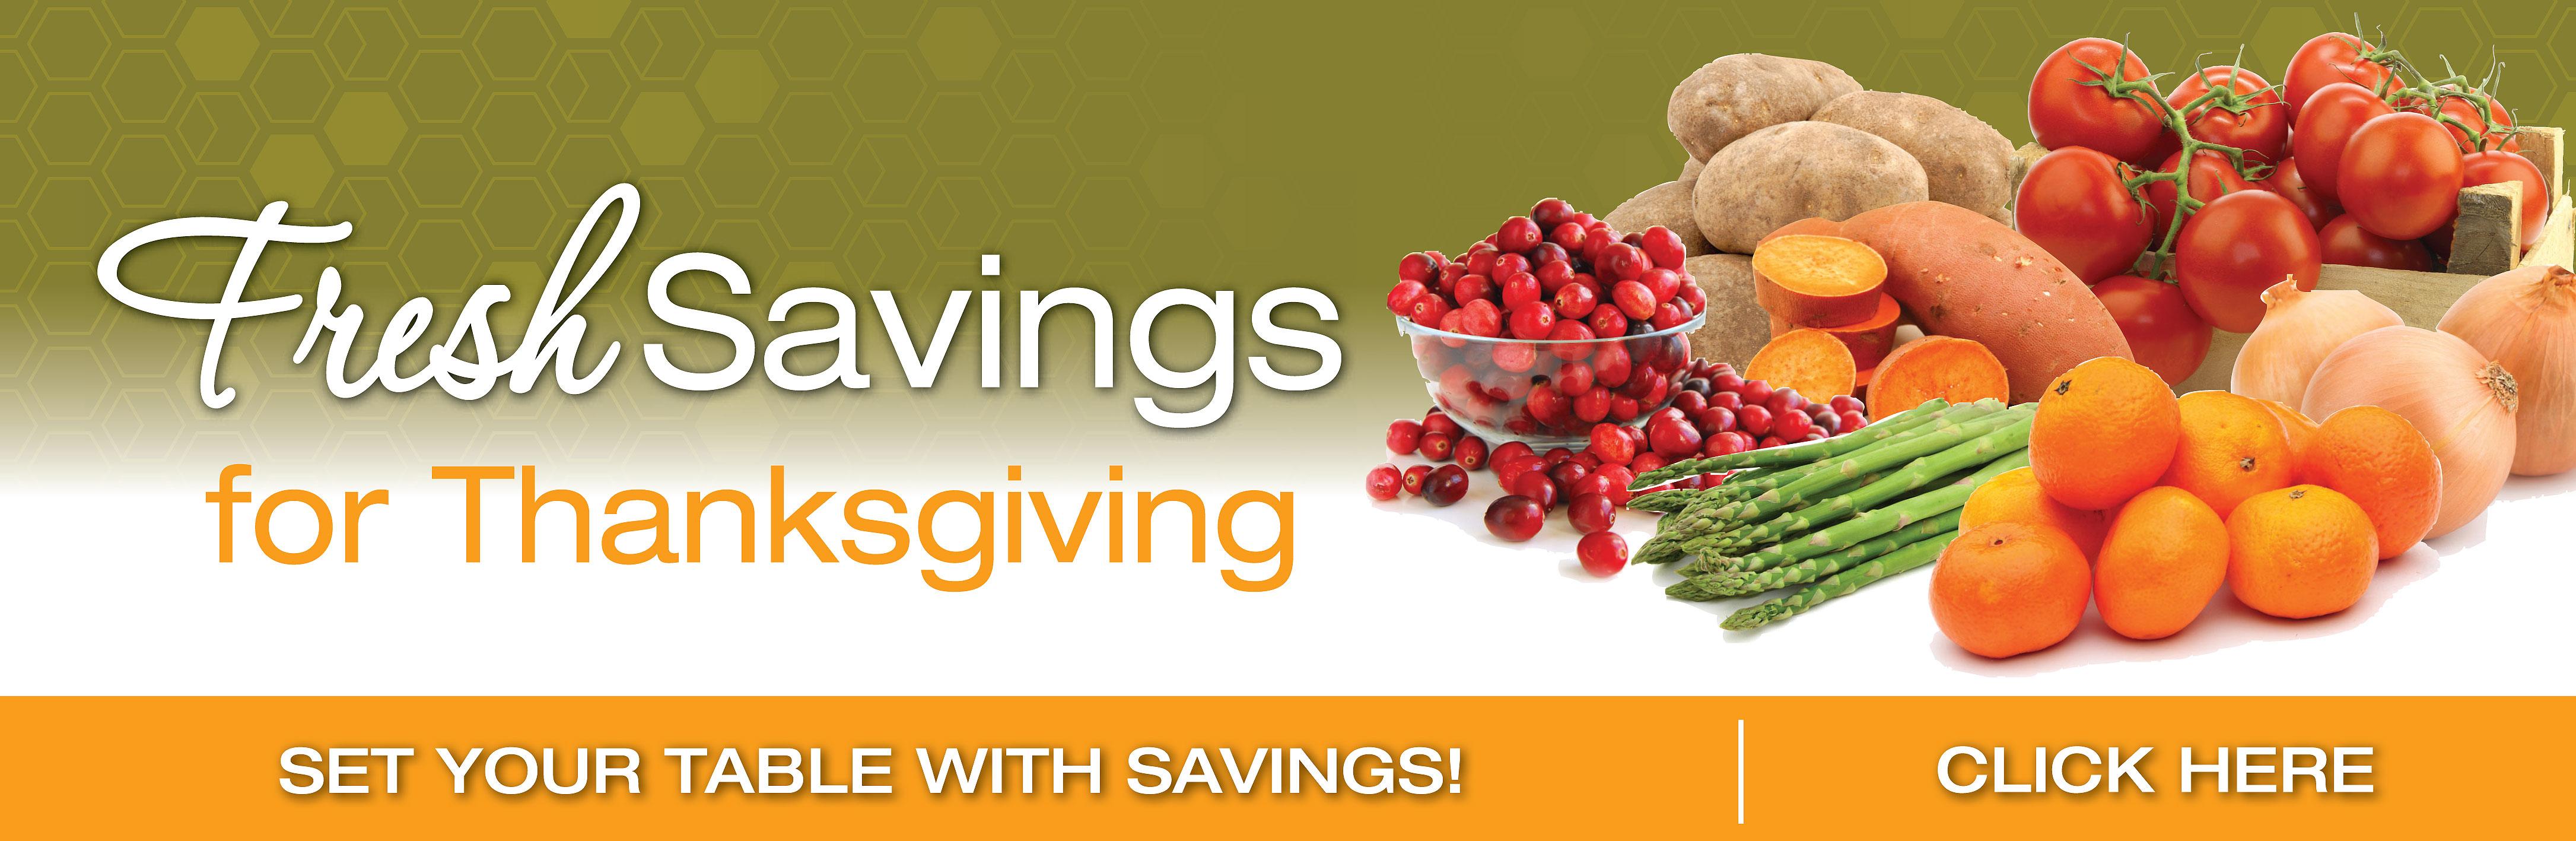 Fresh Savings For Thanksgiving